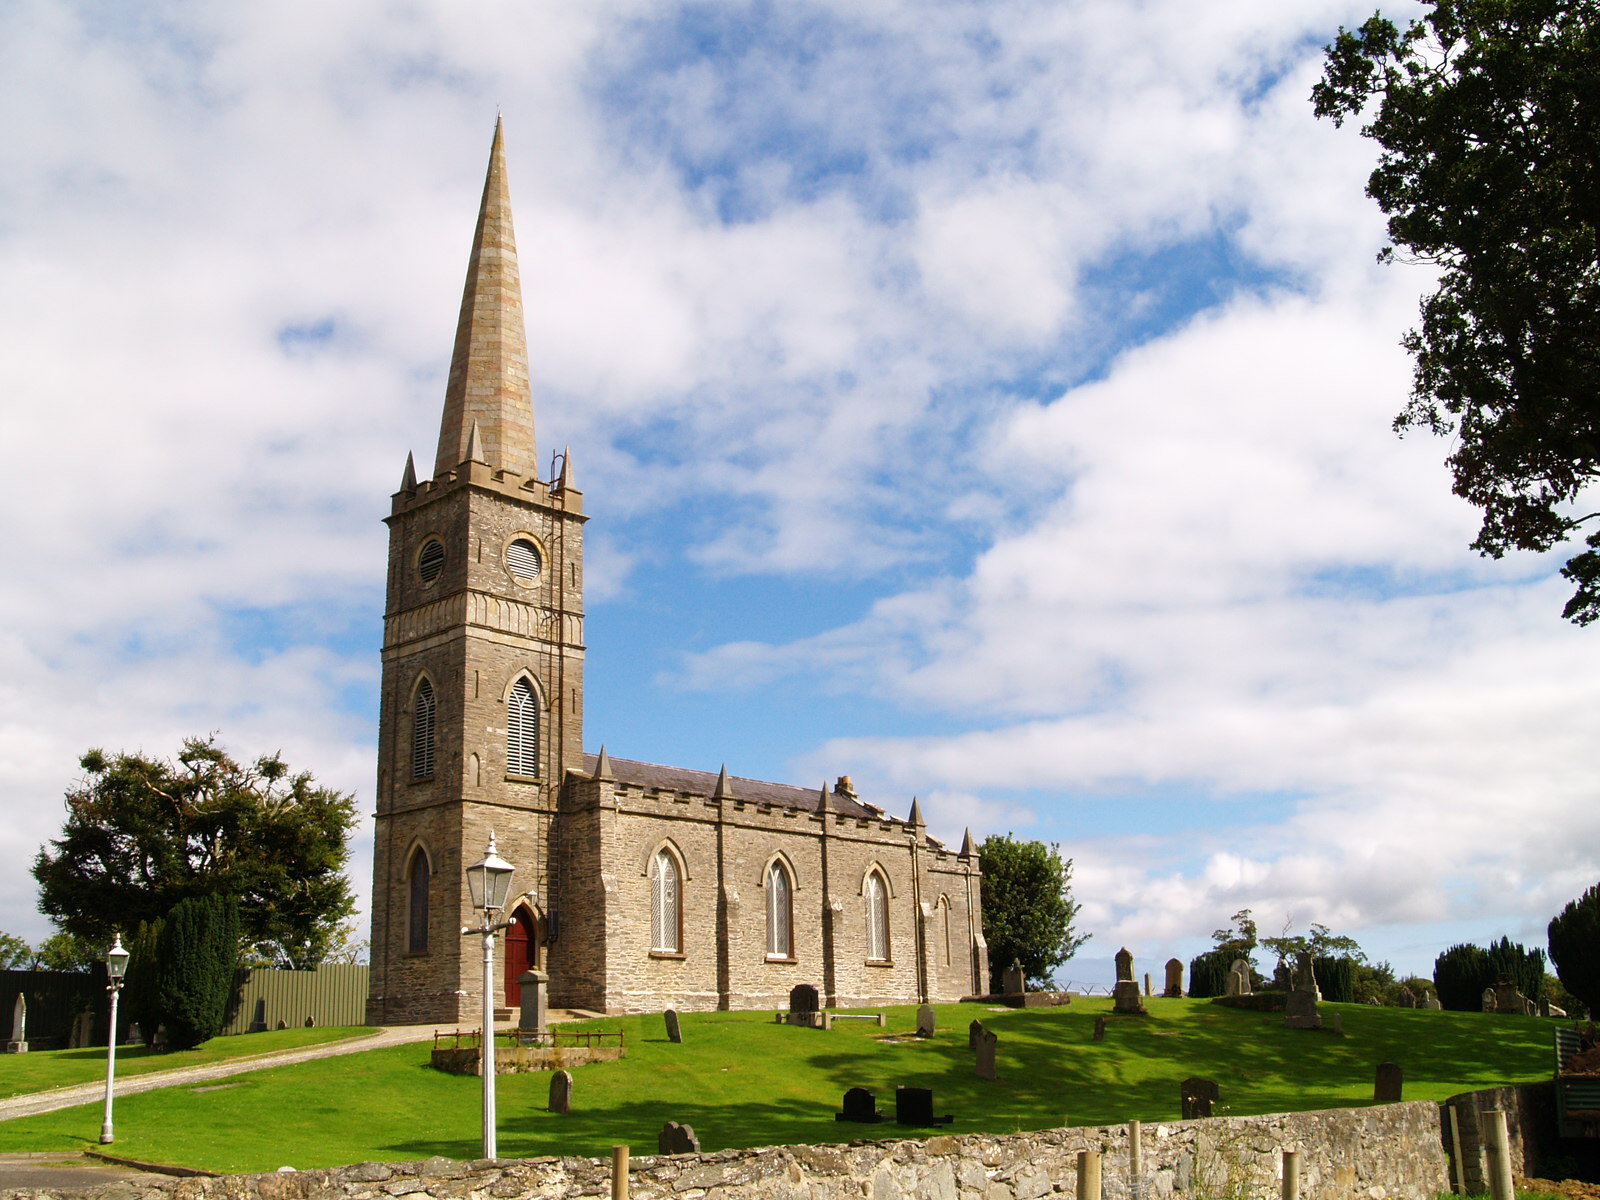 Ballykelly, Tamlaghtfinlagan Parish (c) Philip Mullan